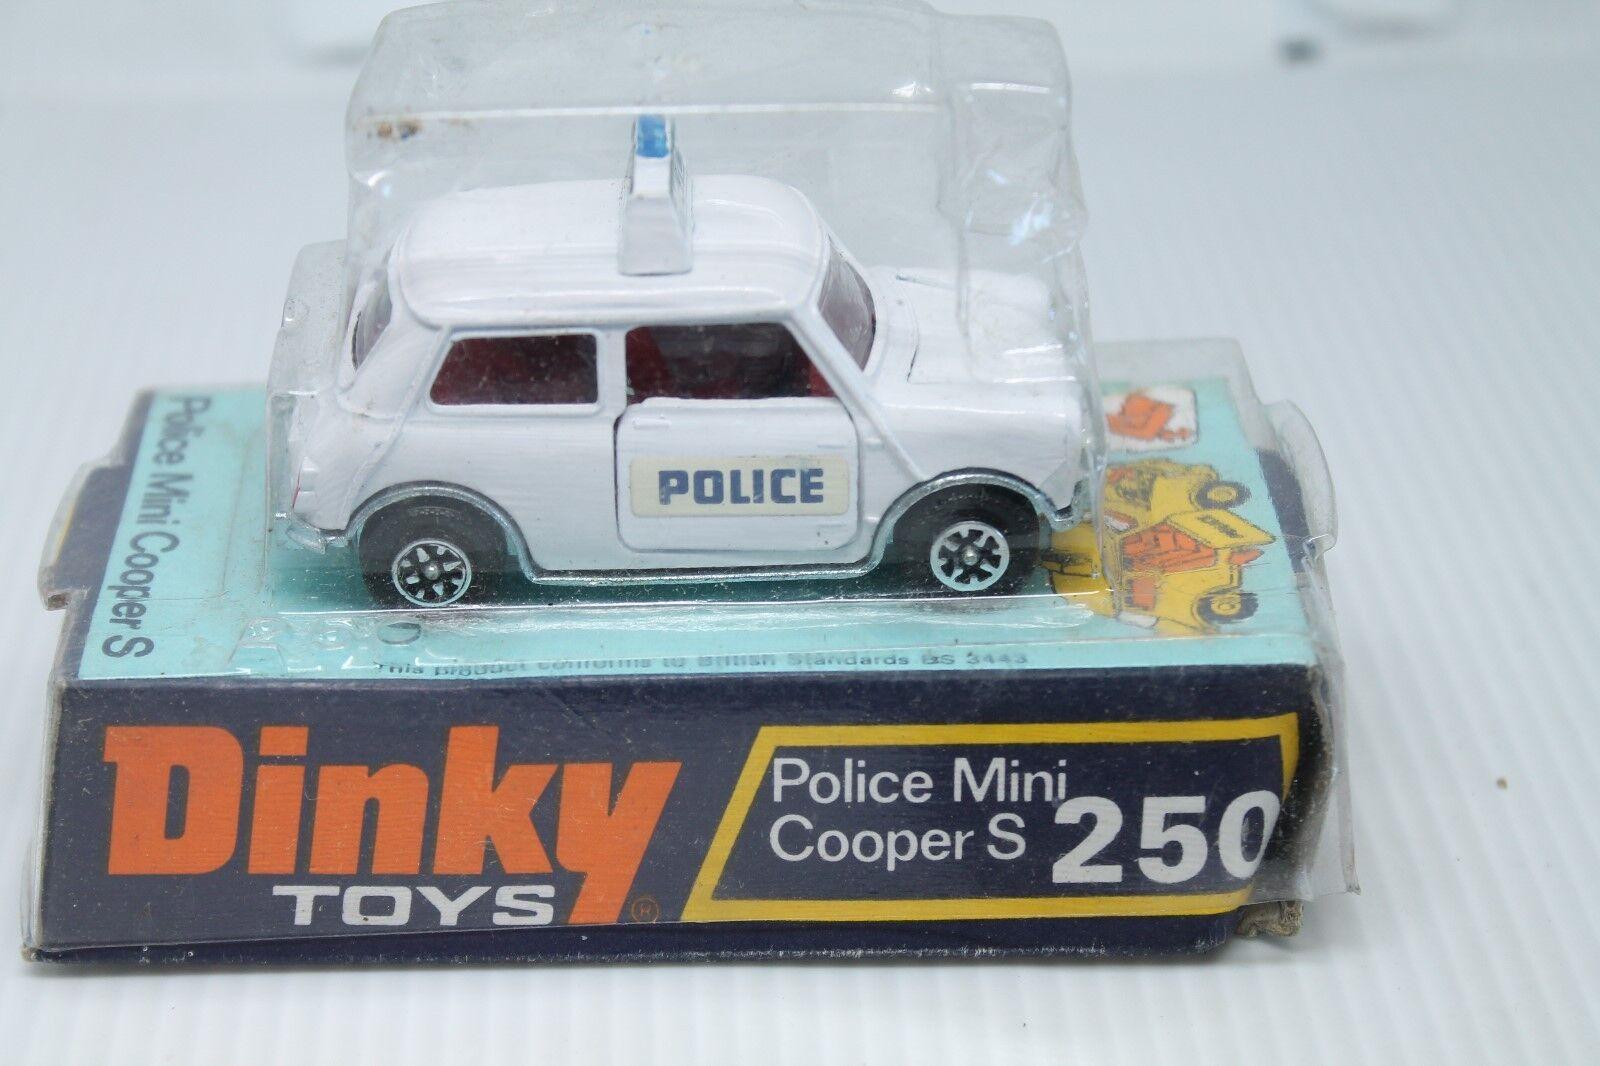 Dinky Juguetes 250  mini cooper s police  1 43  embalaje original  speedwheels  1973 (2)